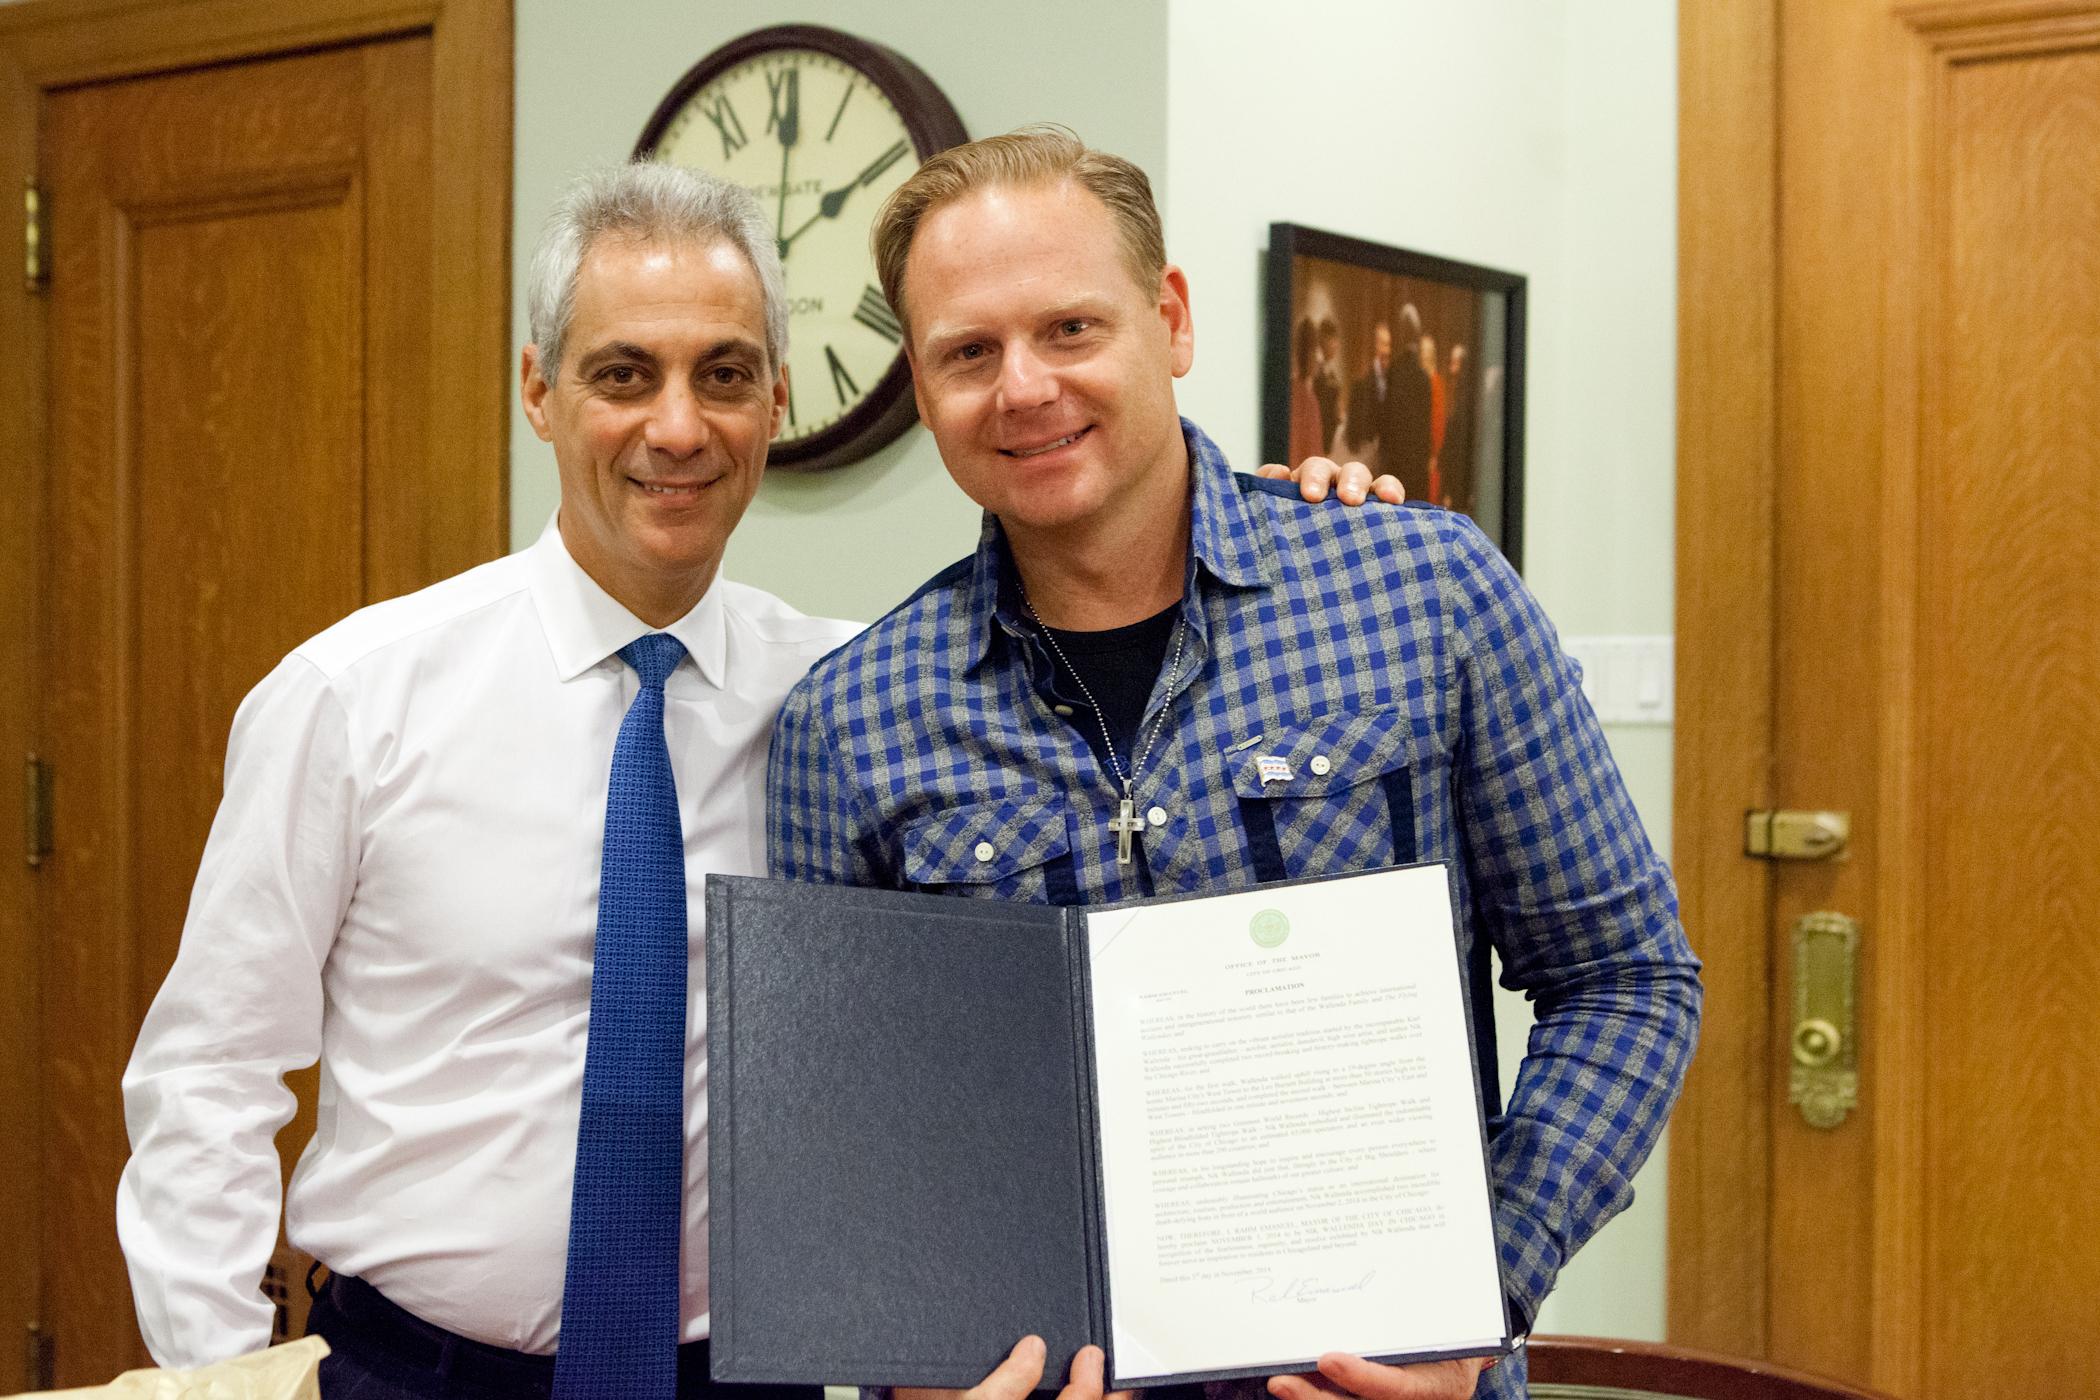 Nik Wallenda with Mayor Emanuel